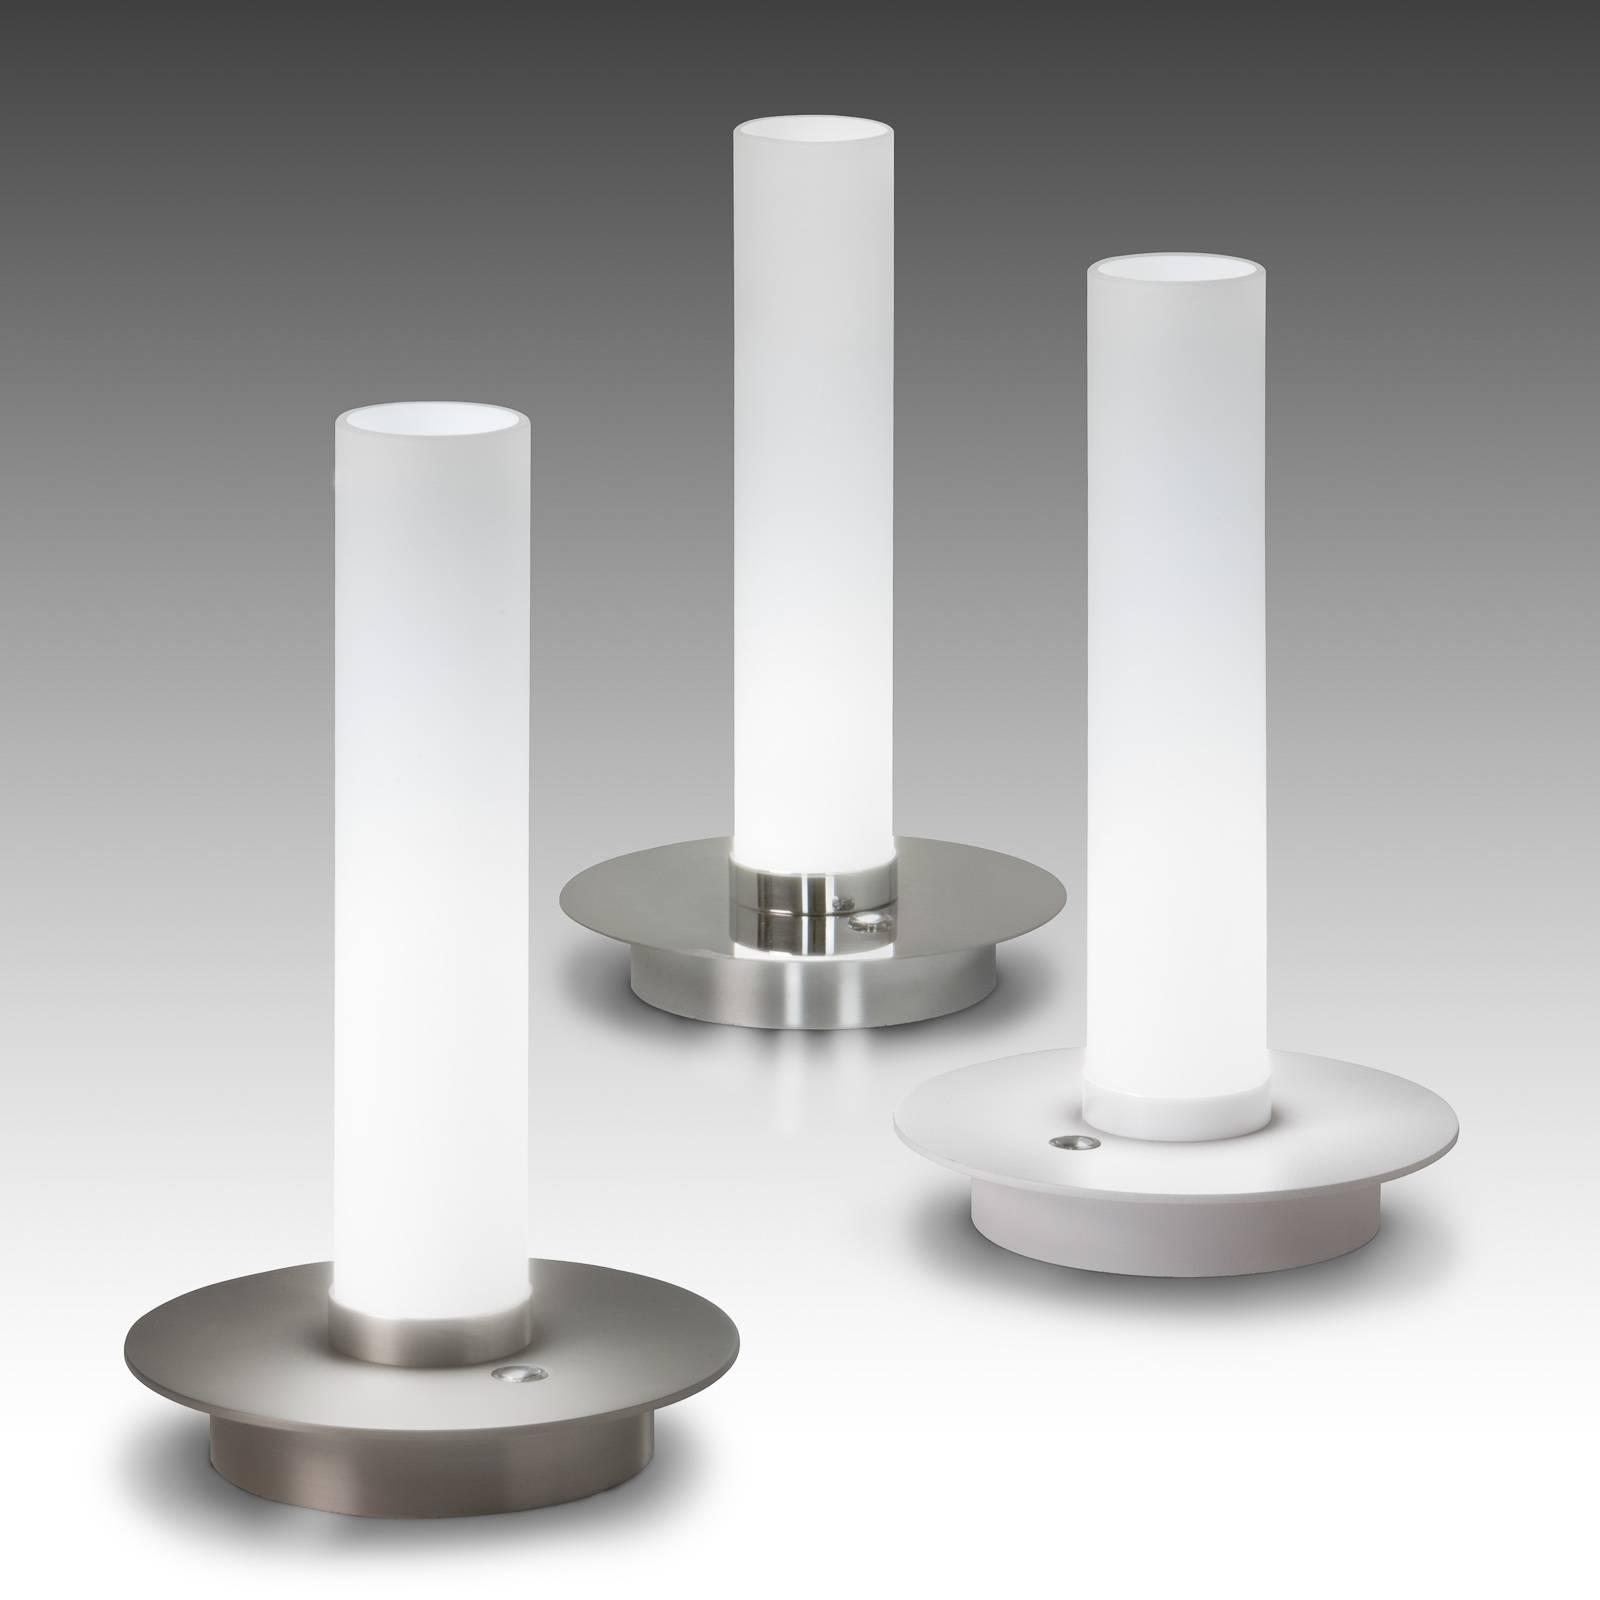 LED-pöytälamppu Candle, valkoinen